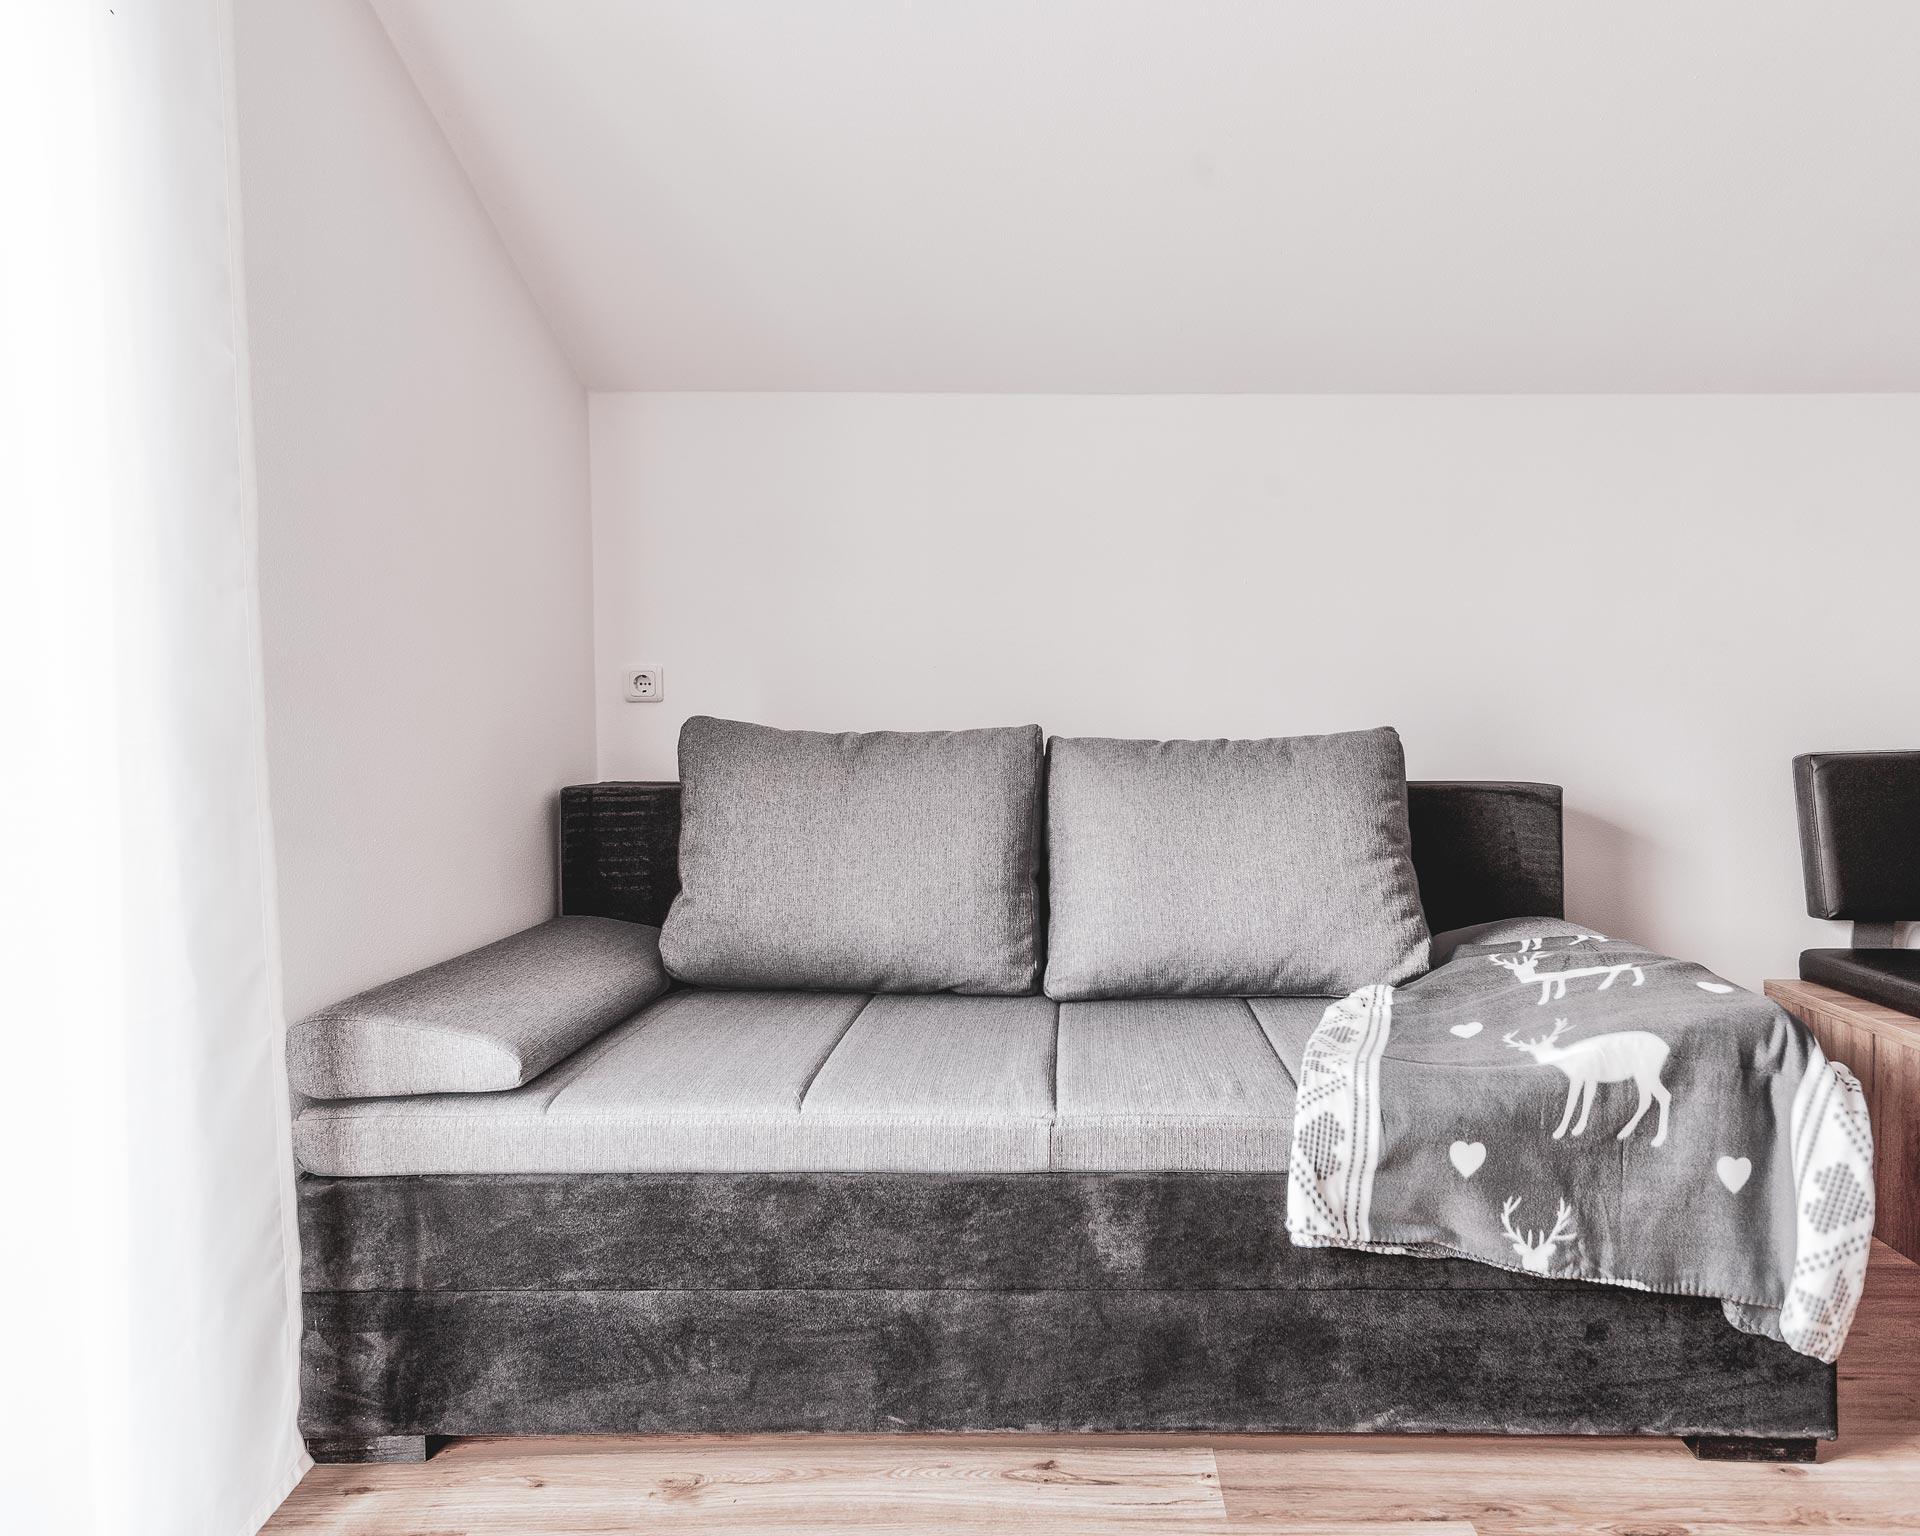 divan wohnkueche appartement ahornach pfarrwirt sand in taufers